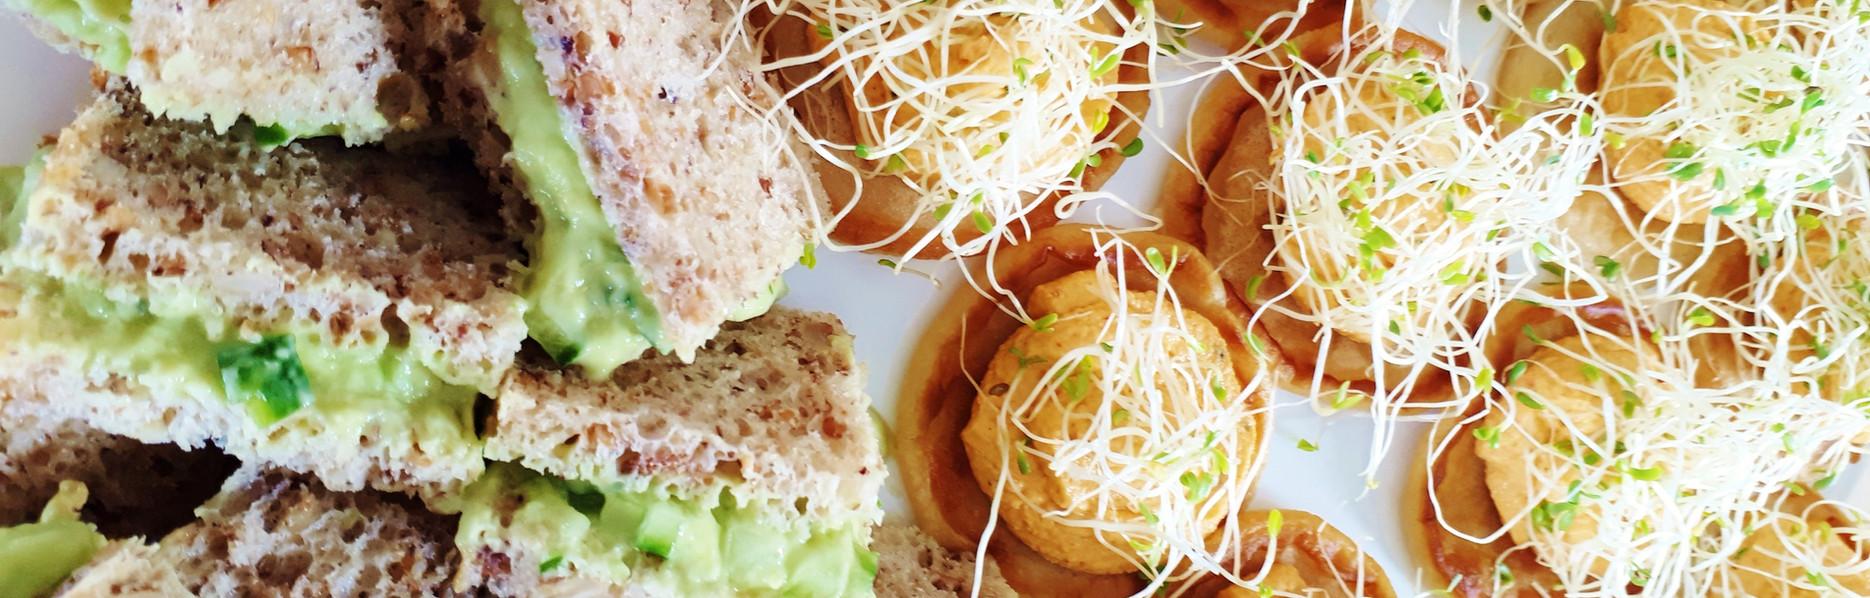 Gluten-free platter